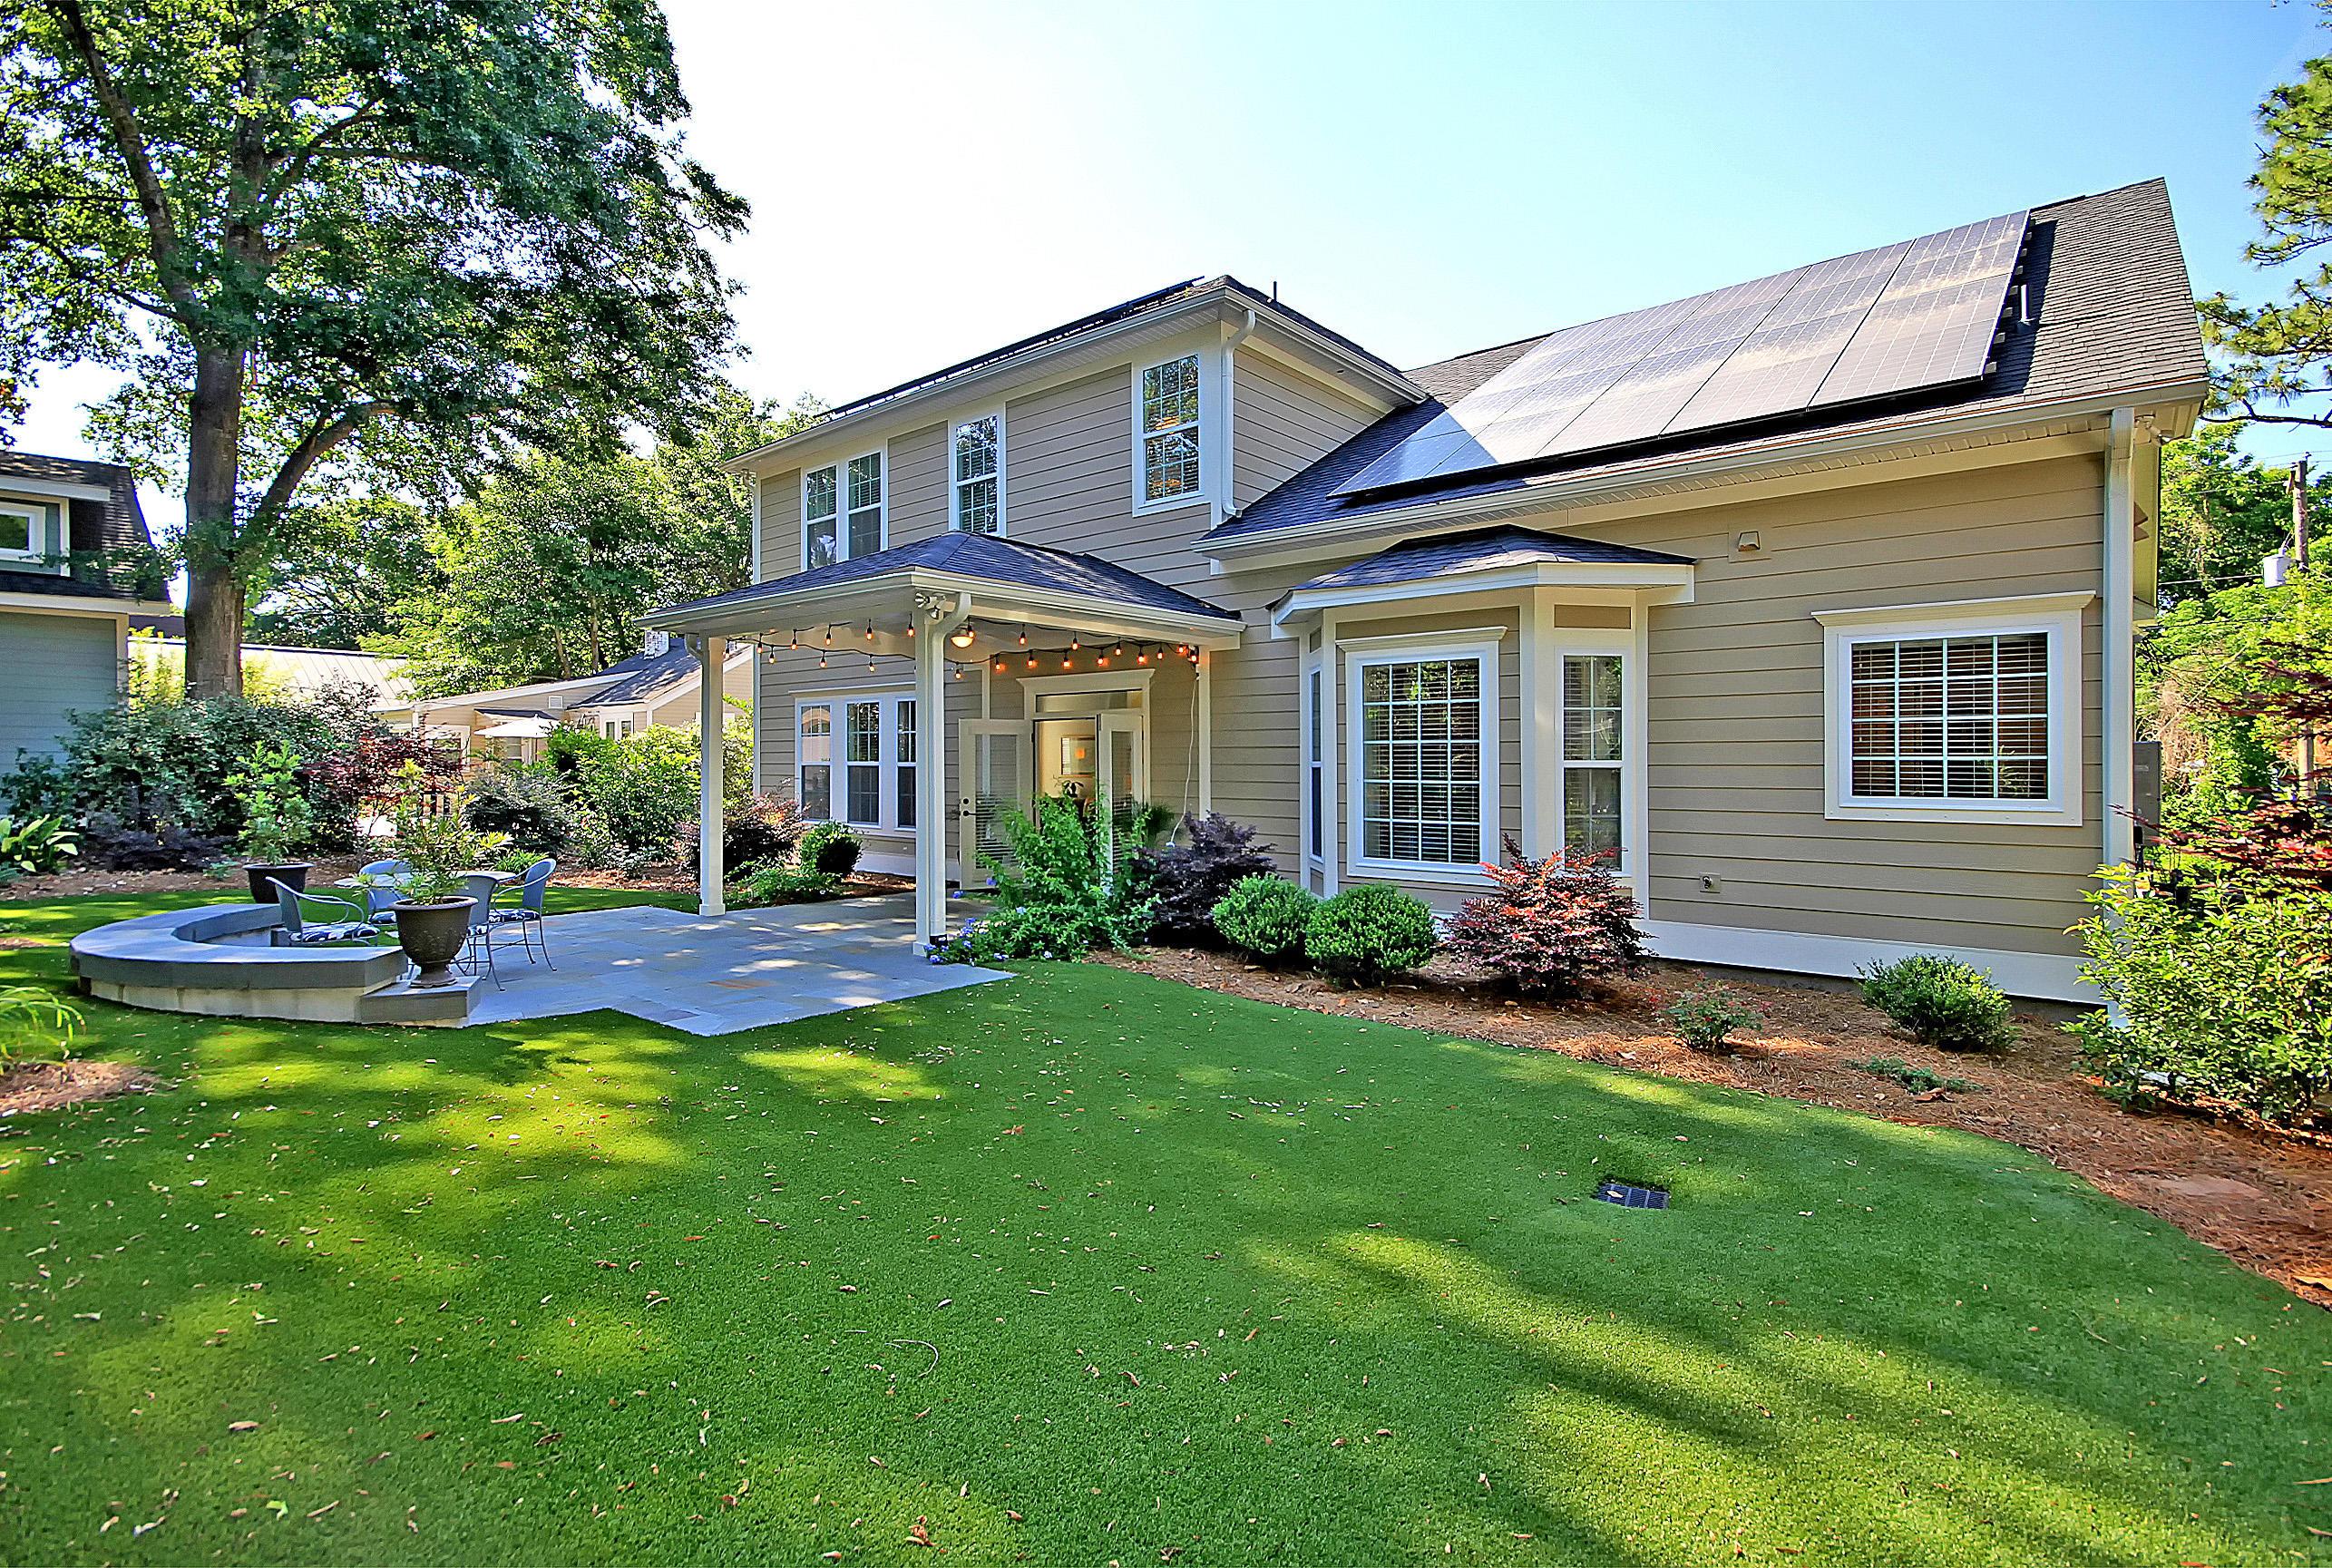 Riverland Terrace Homes For Sale - 2153 Fort Pemberton, Charleston, SC - 46